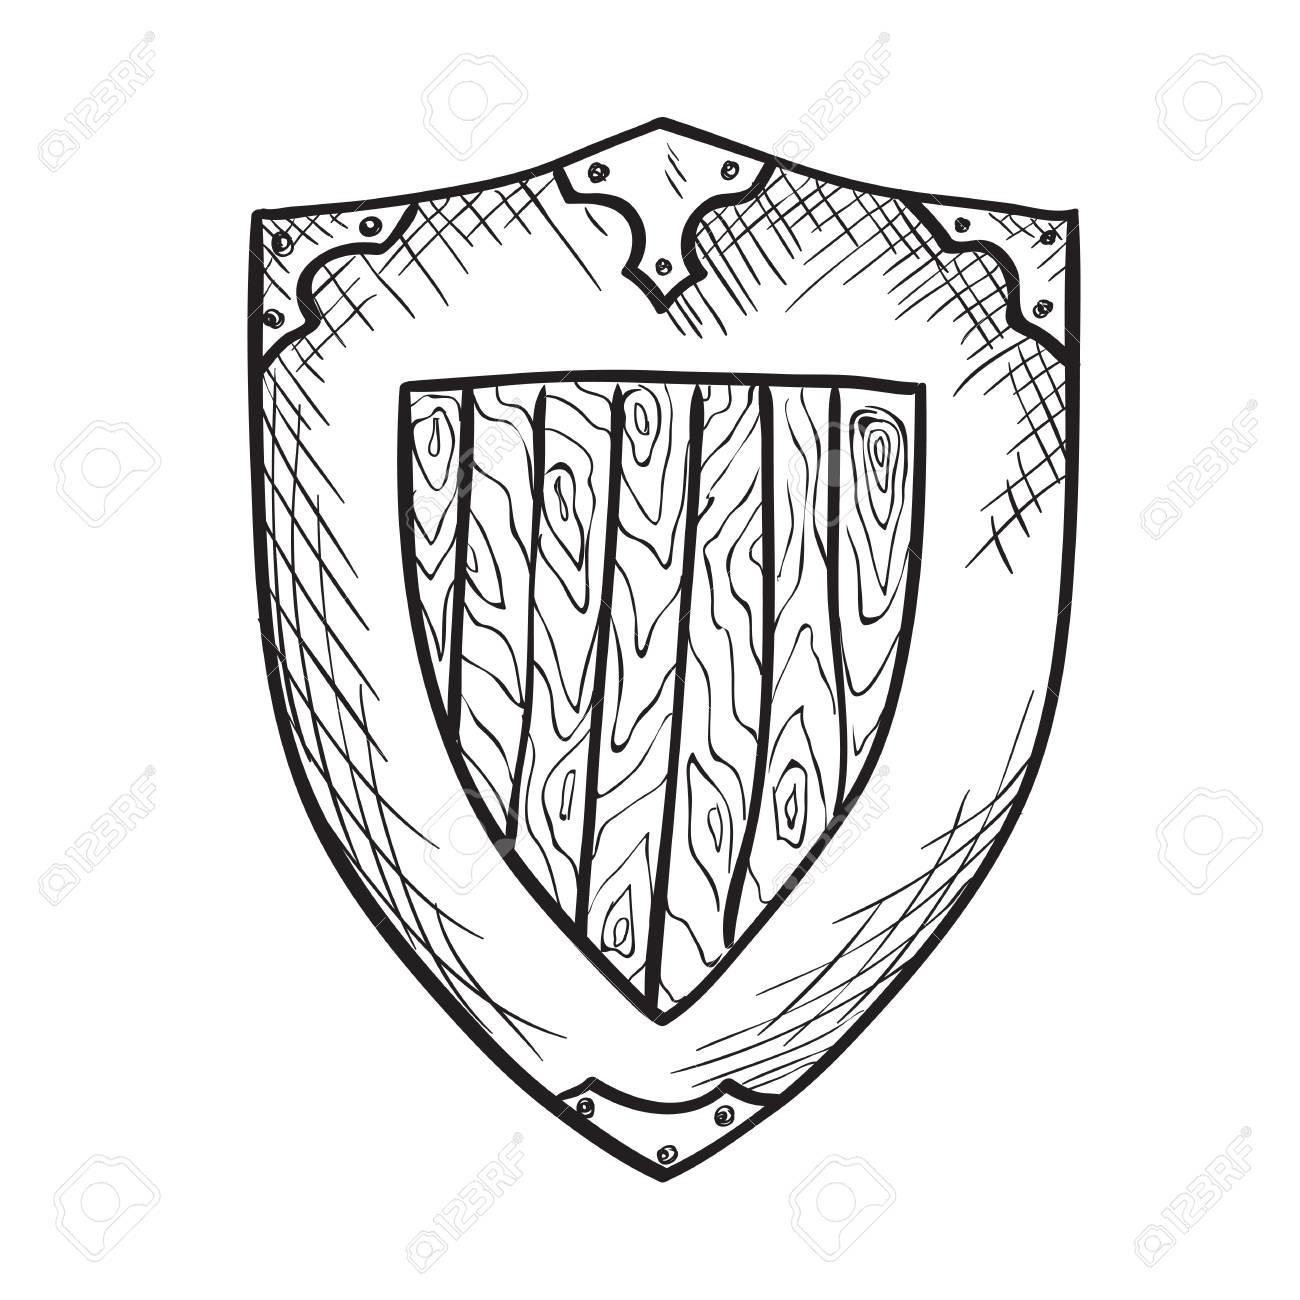 1300x1300 Hand Drawn Sketch Medieval Shield, Ink Drawing Imitation Stock